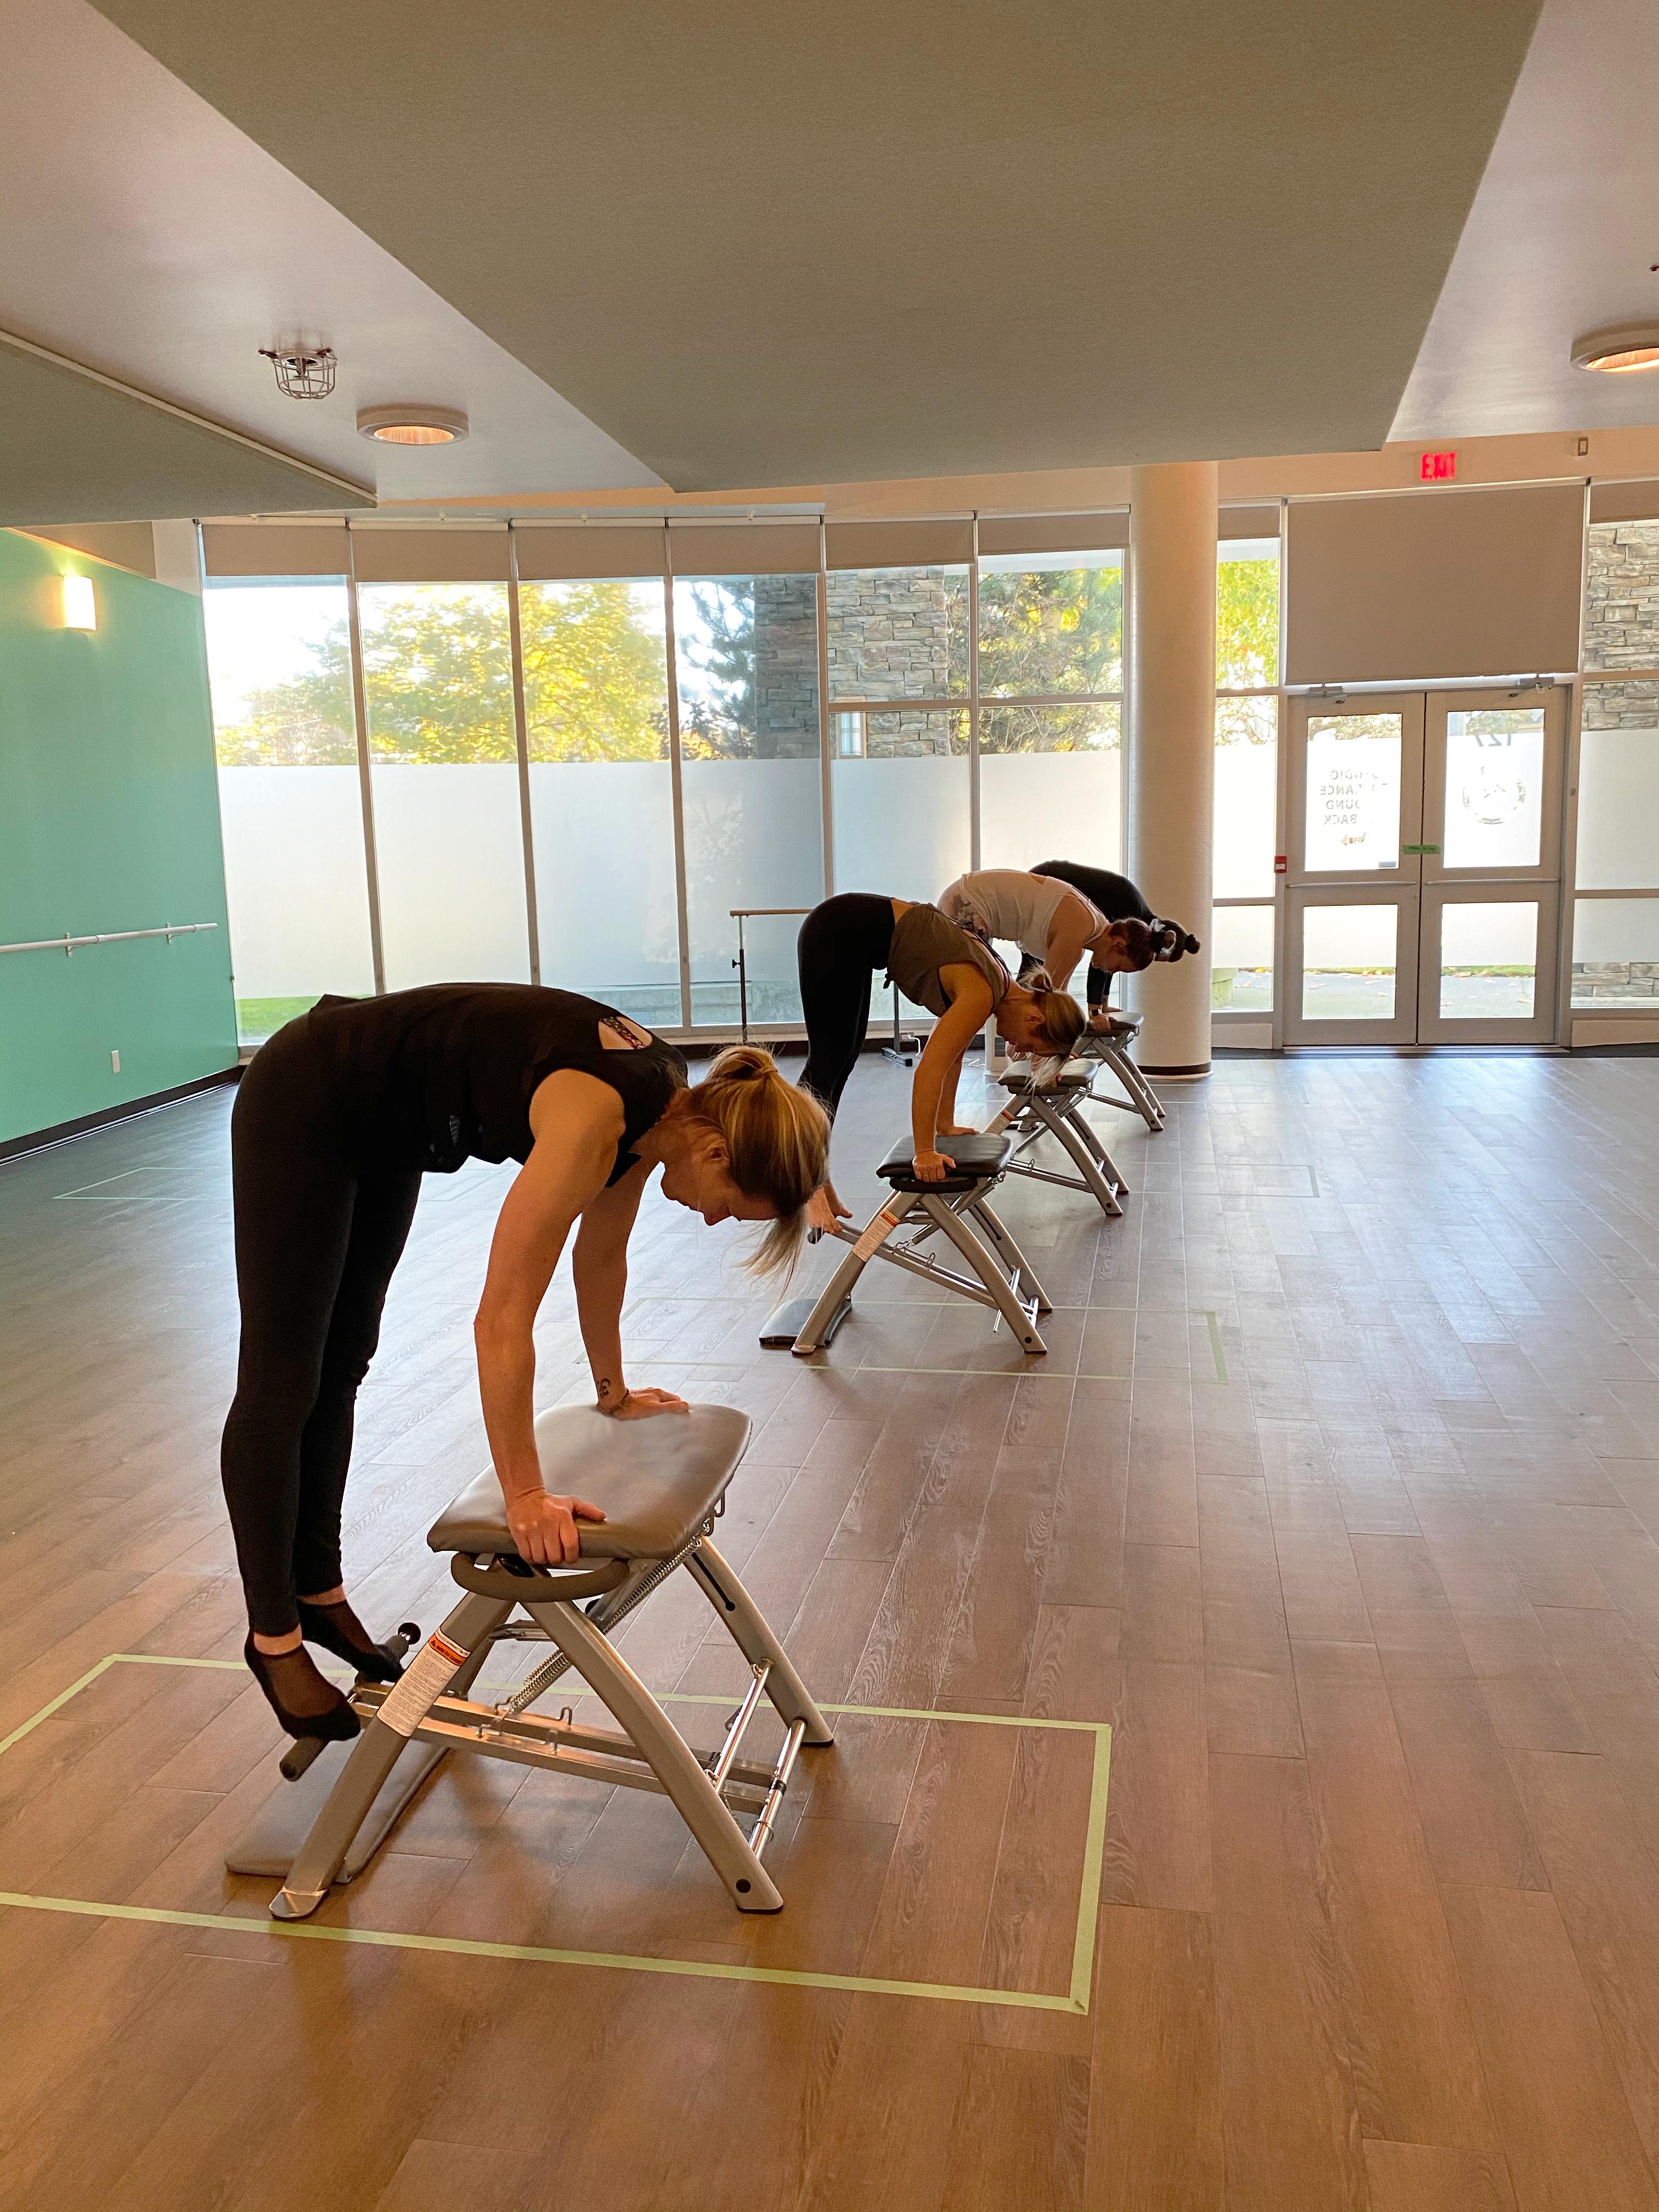 Beginners Pilates Pro Chair Class - FREE